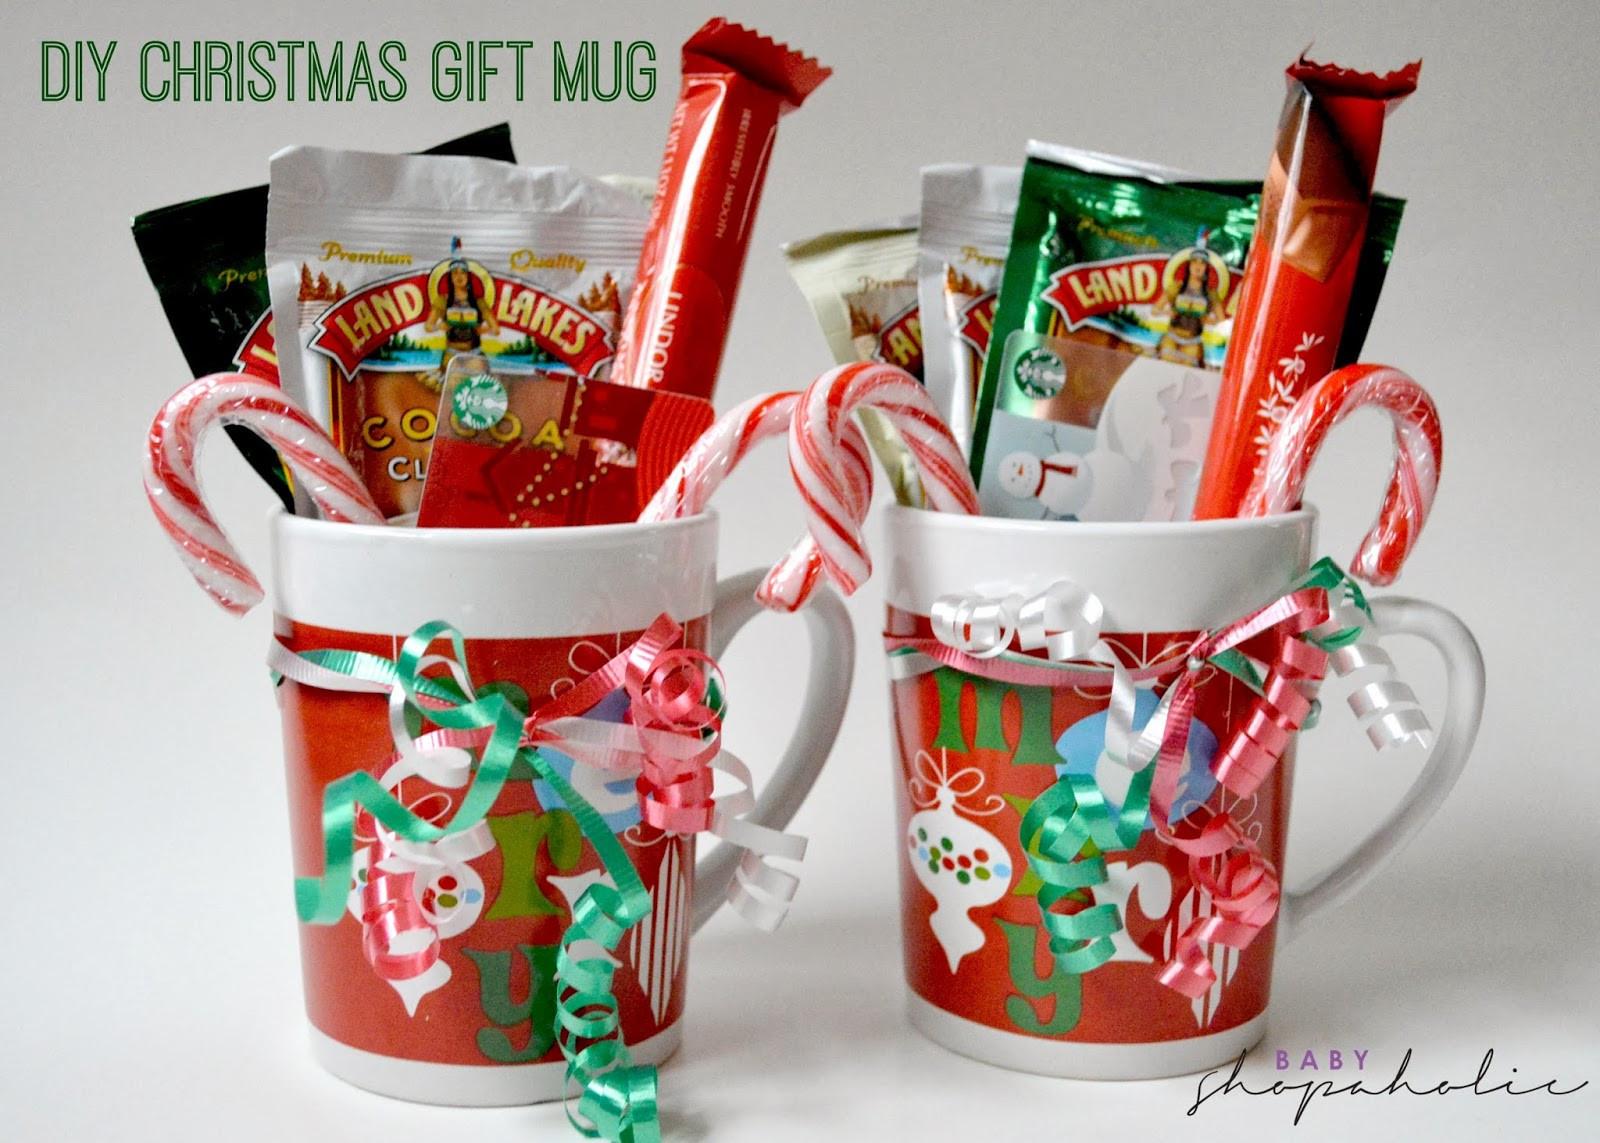 Christmas Mug Gift Ideas  Last Minute DIY Christmas Gift Baby Shopaholic